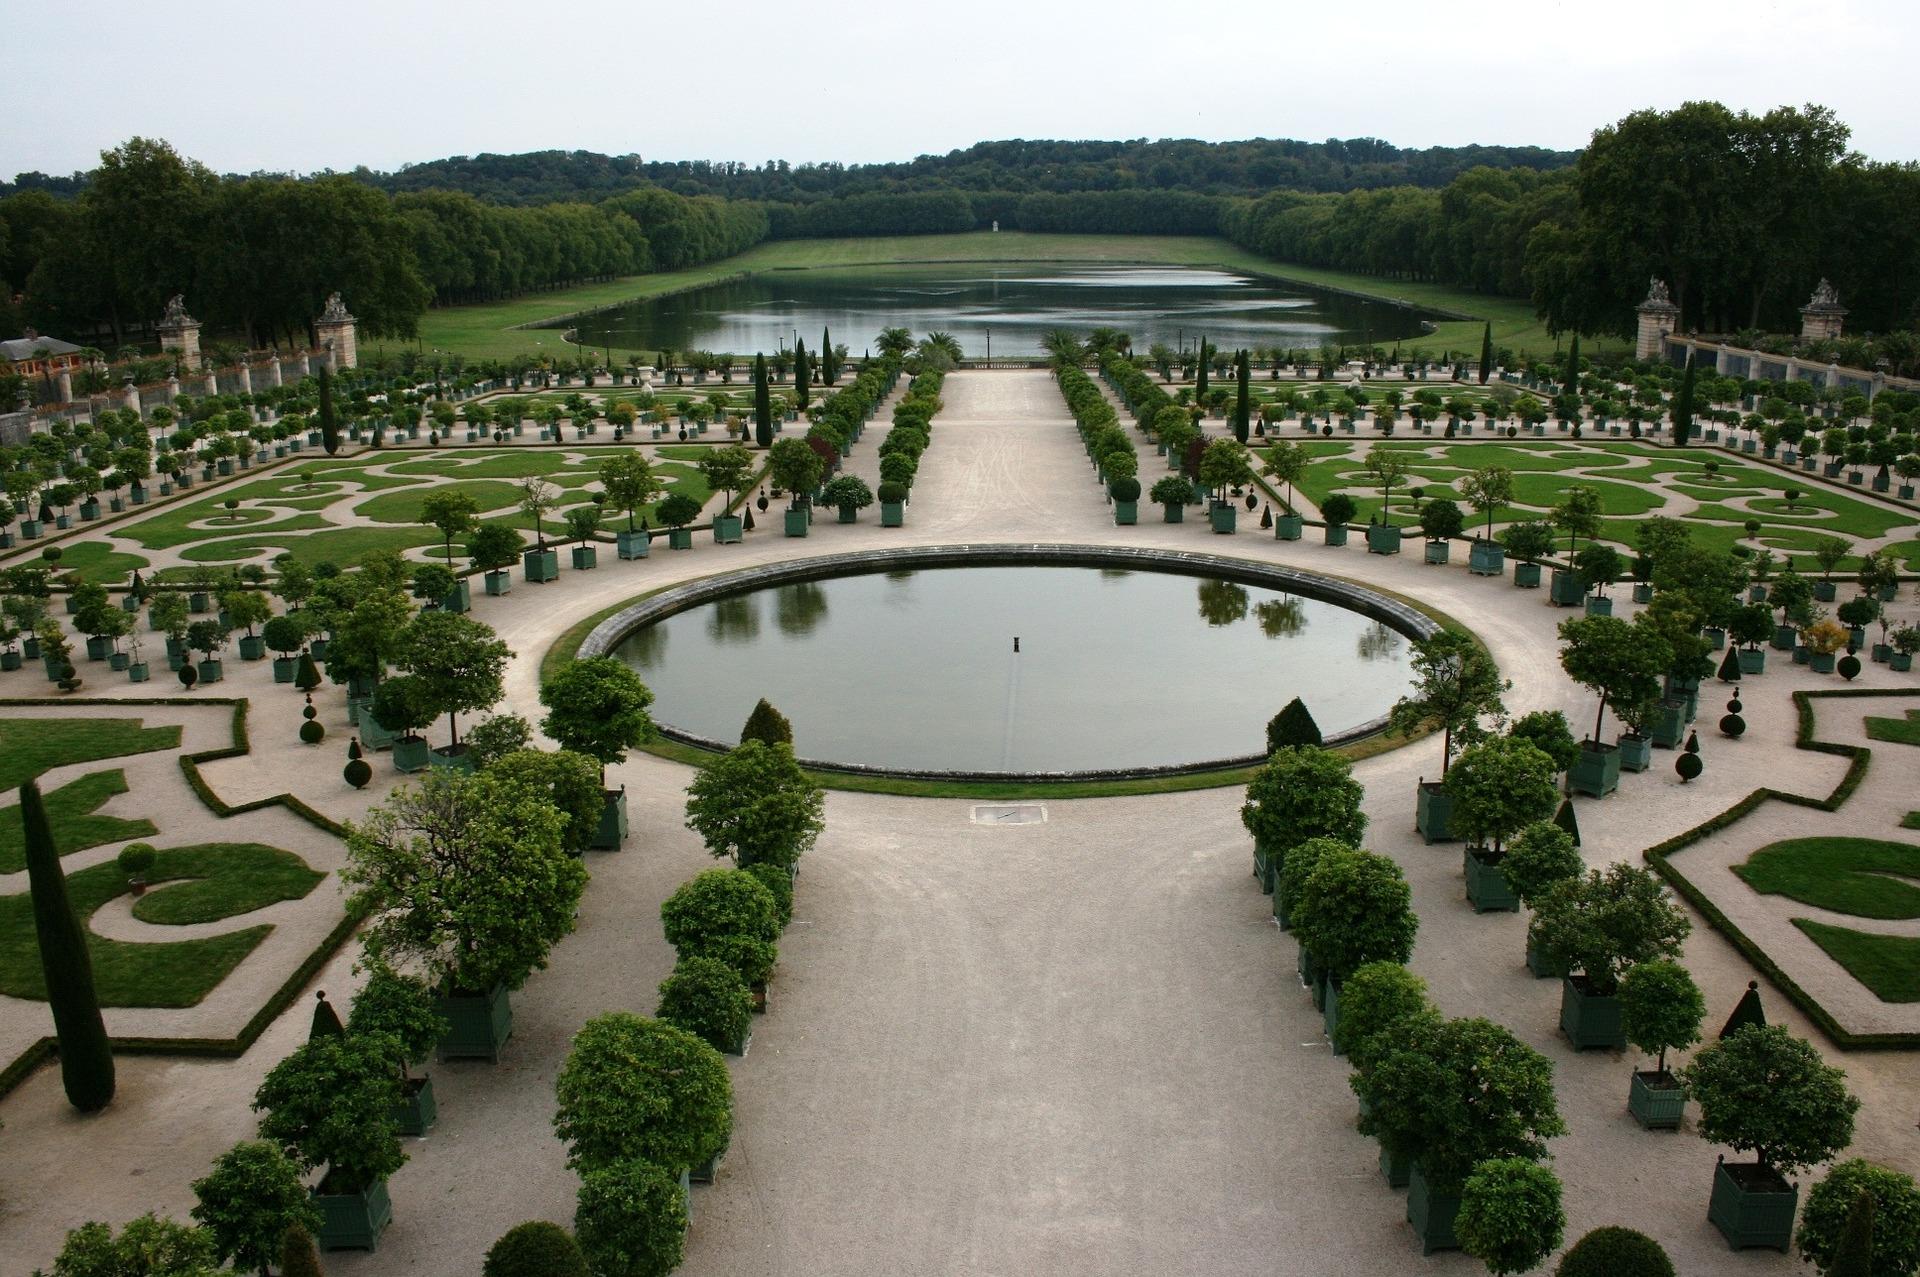 Garden of Palace of Versailles